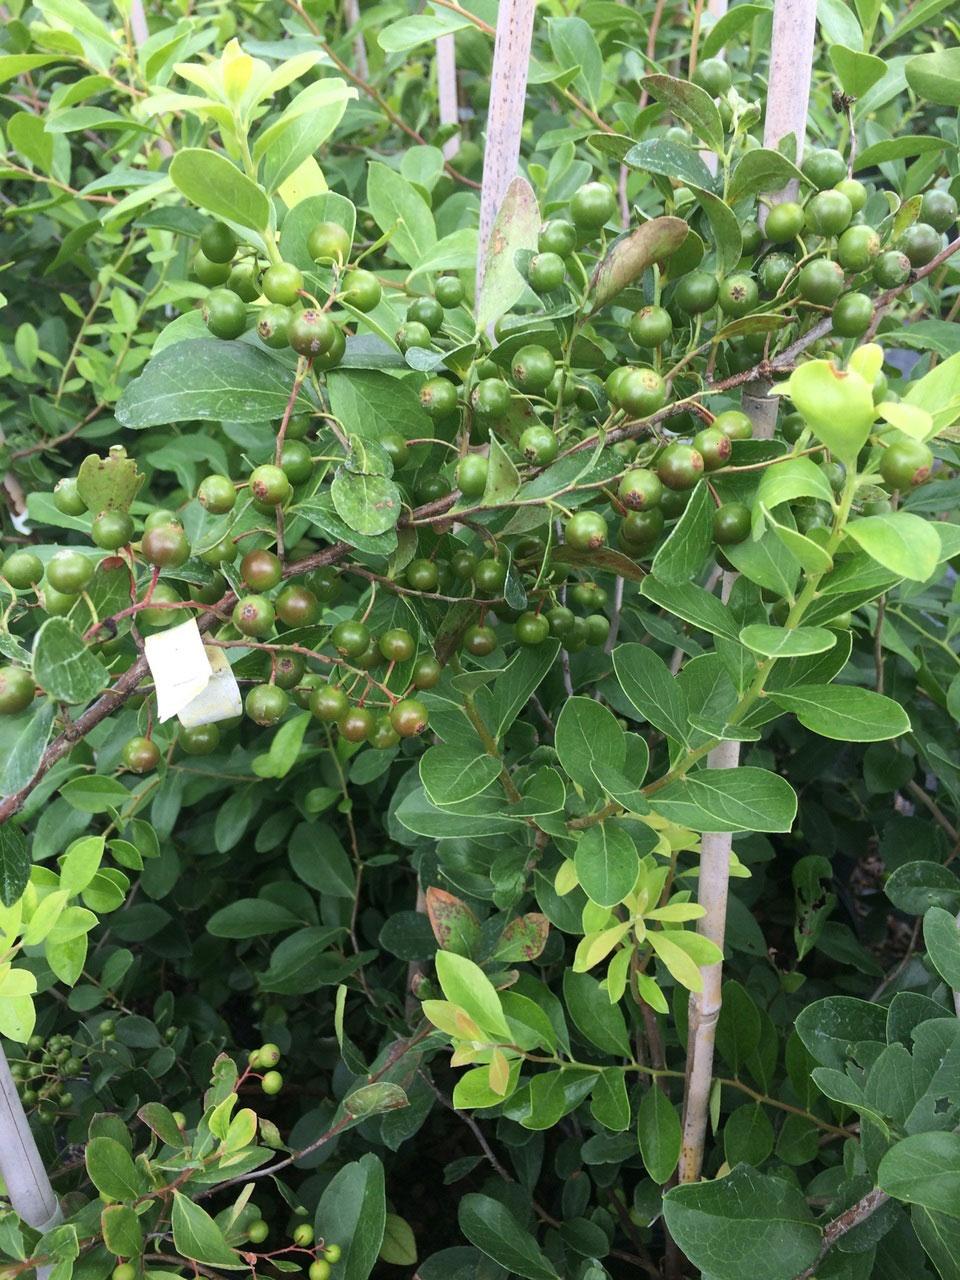 Unripe-fruits-of-Farkleberry